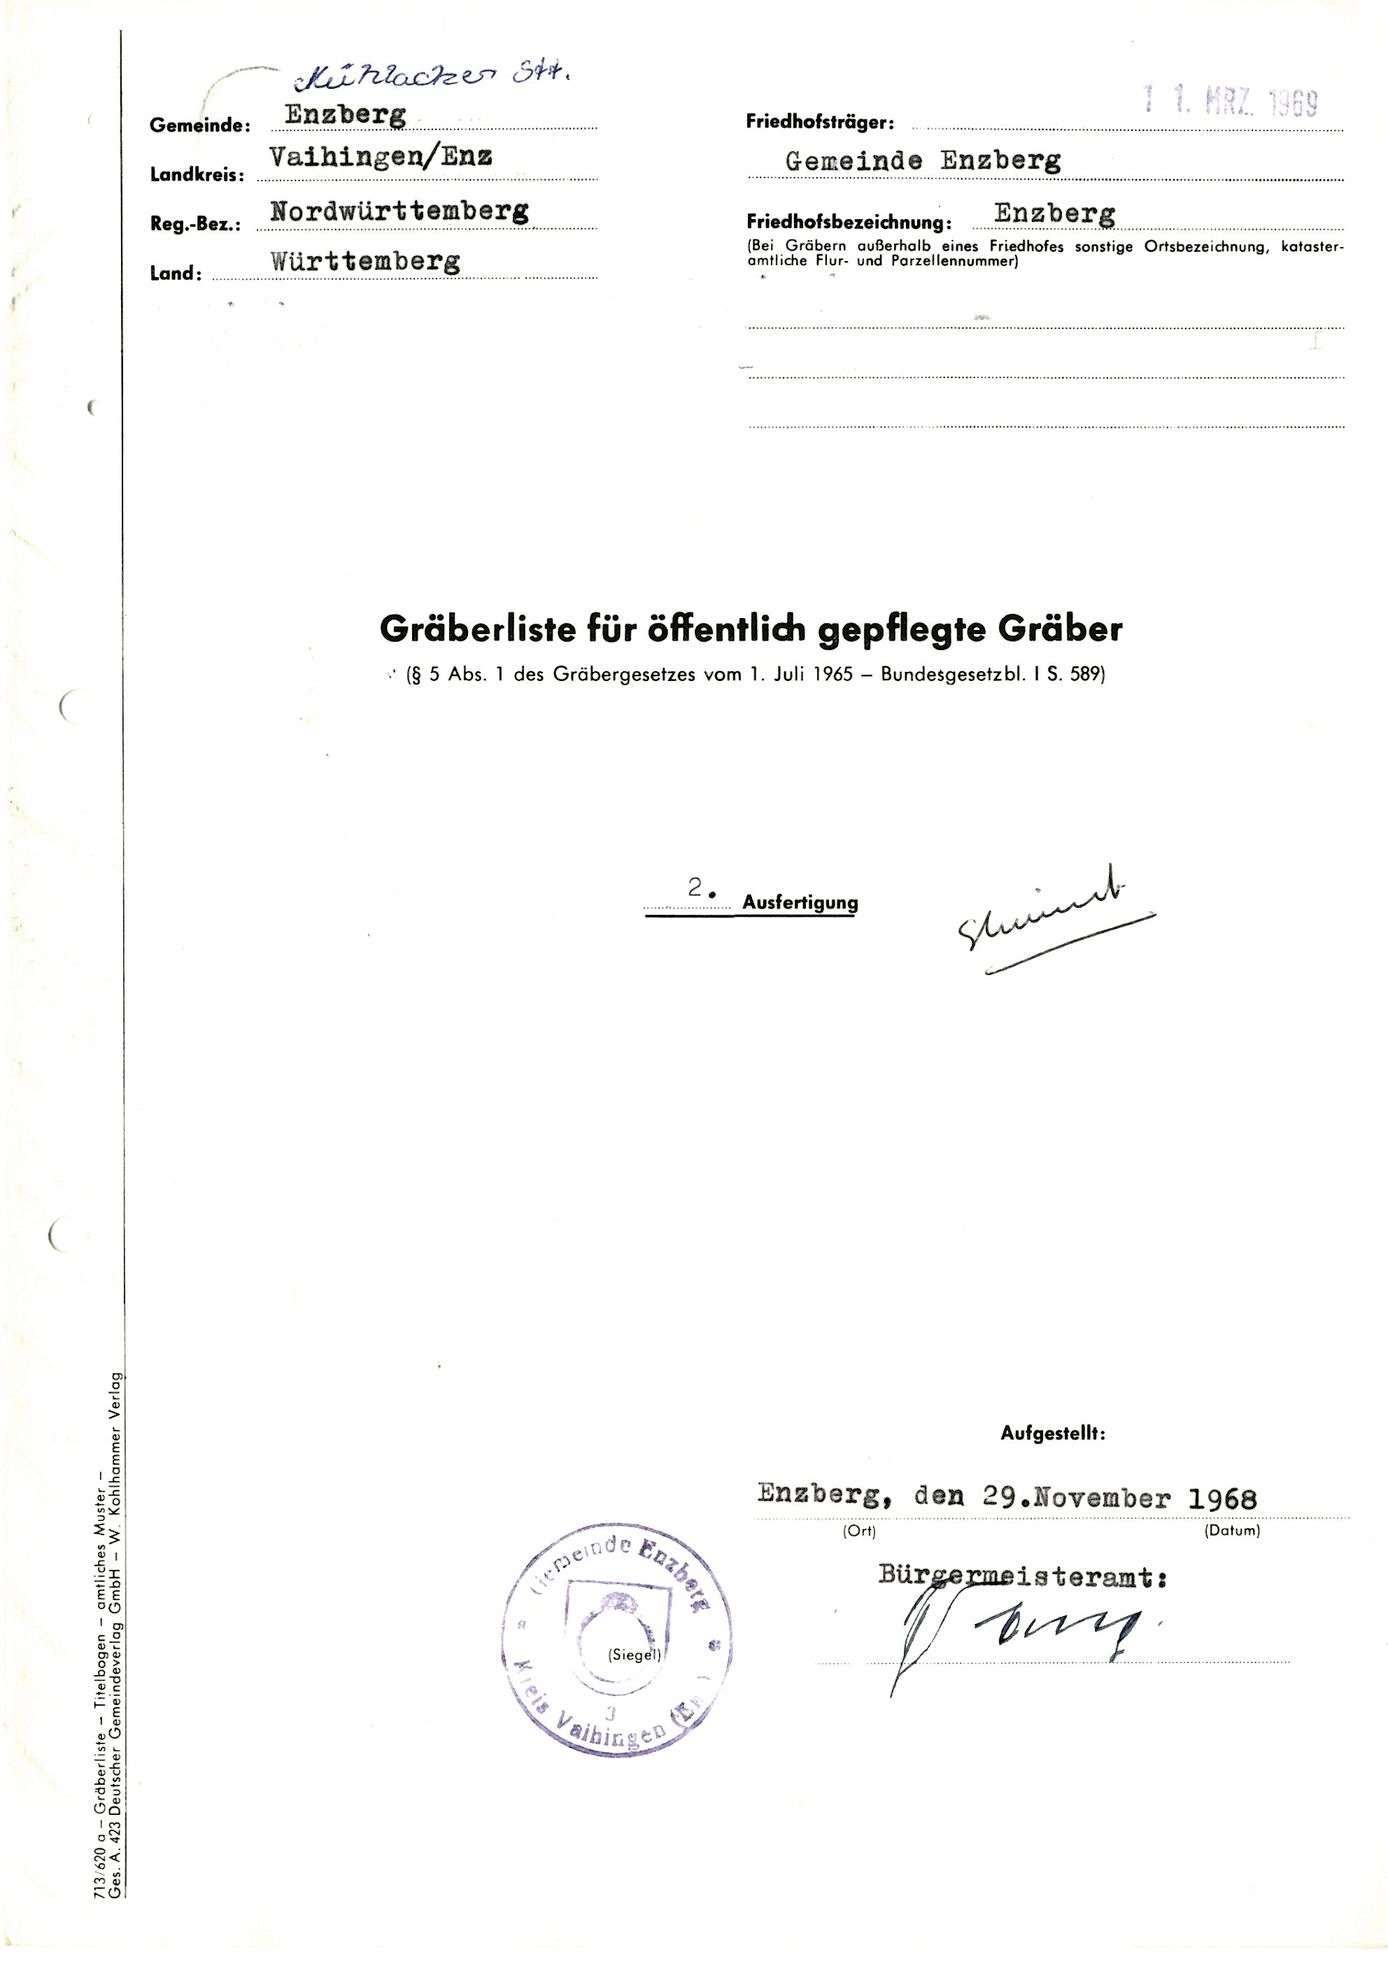 Enzberg, Bild 1